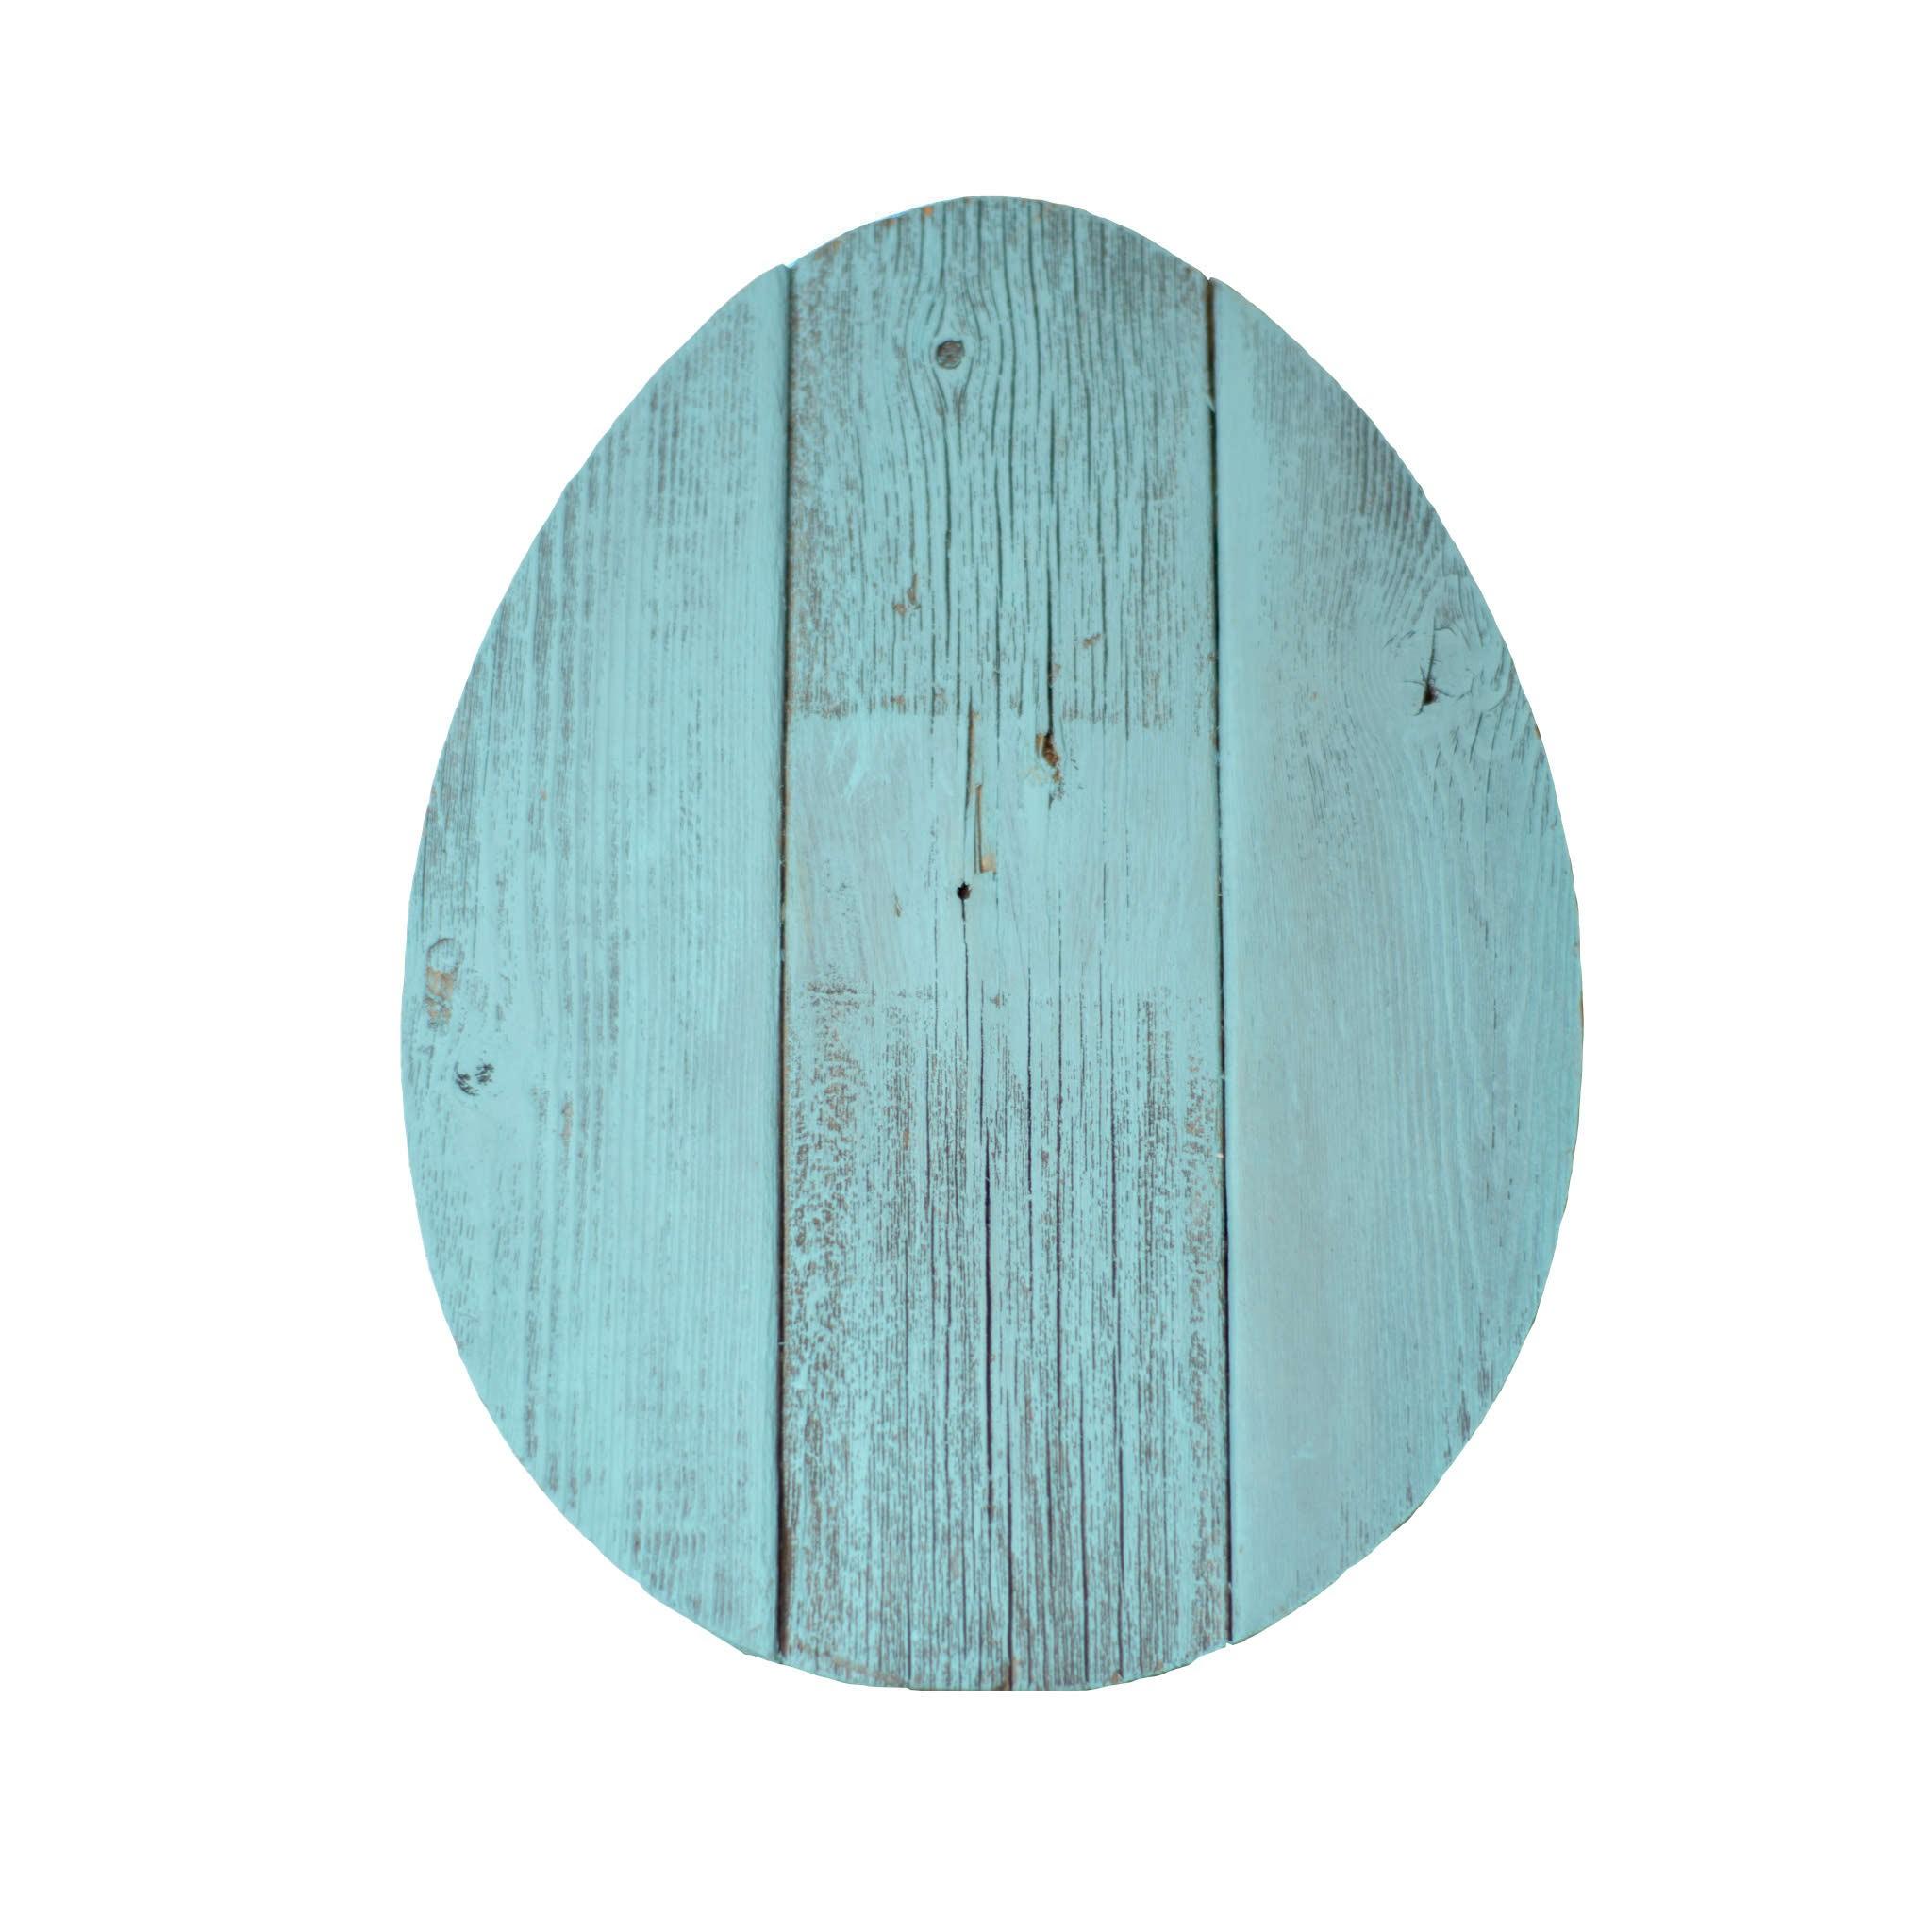 "12"" Farmhouse Turquoise Wooden Large Egg"